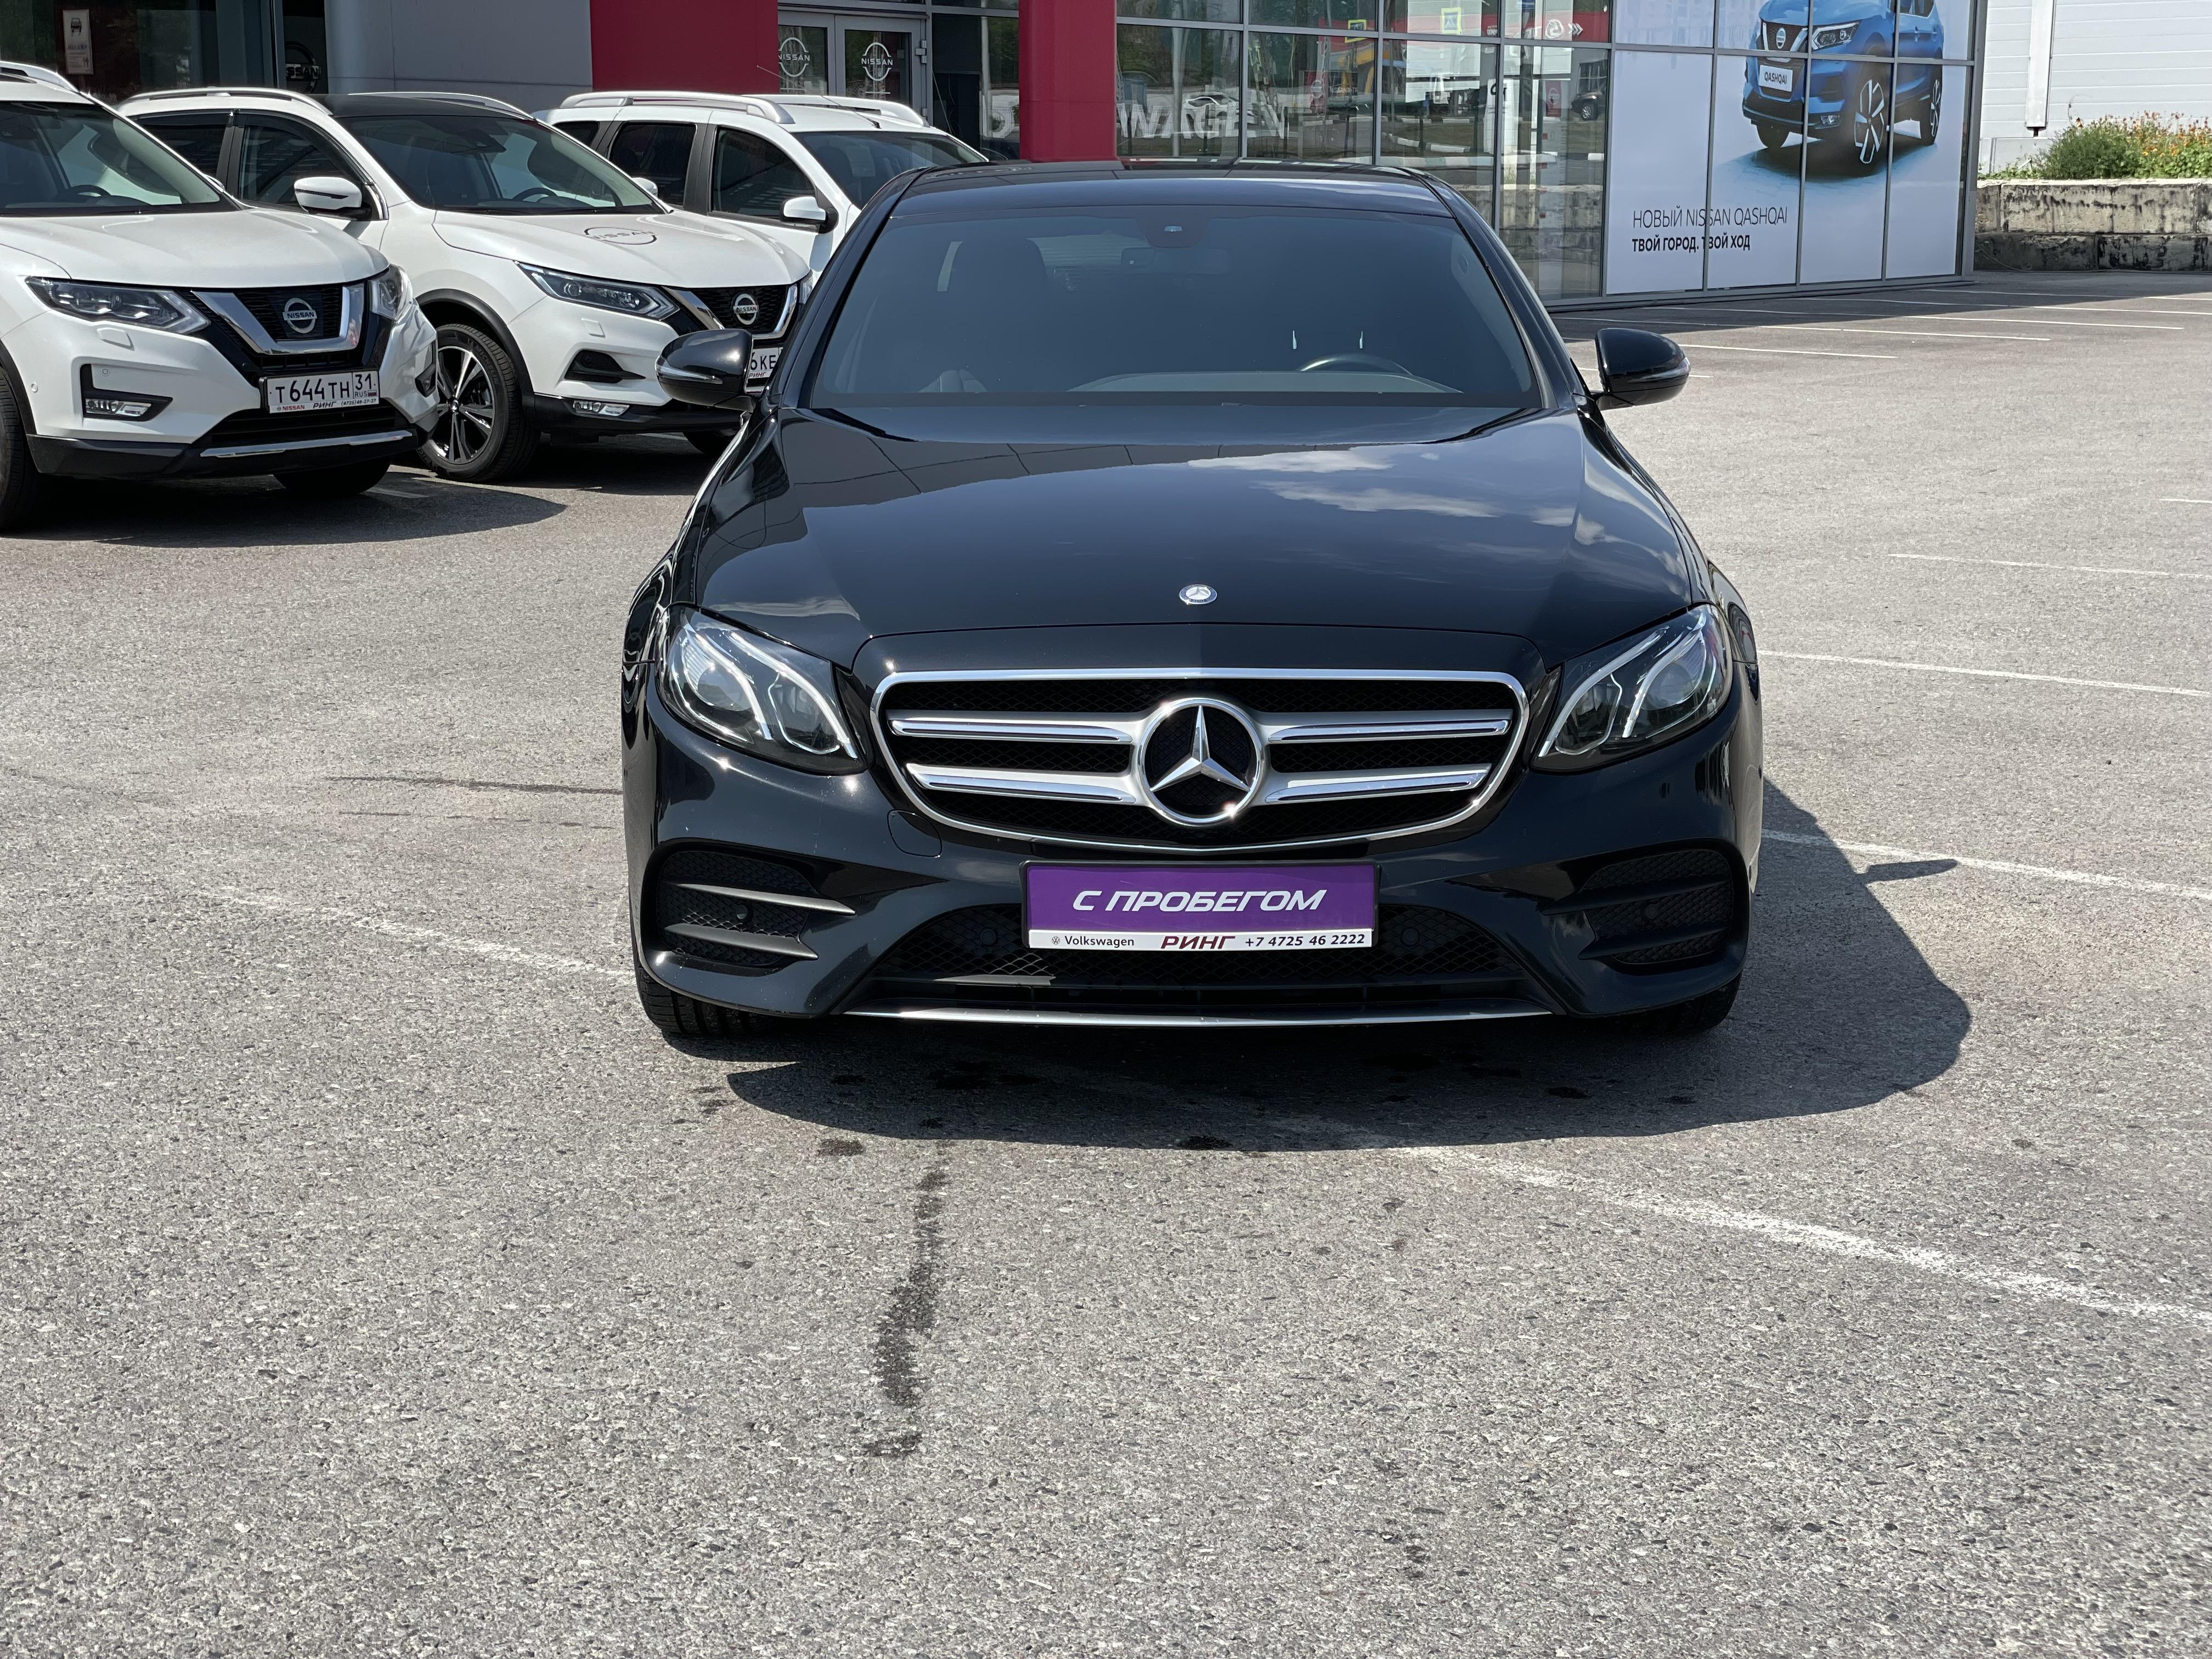 Mercedes-Benz E-Класс Седан (2017г.)